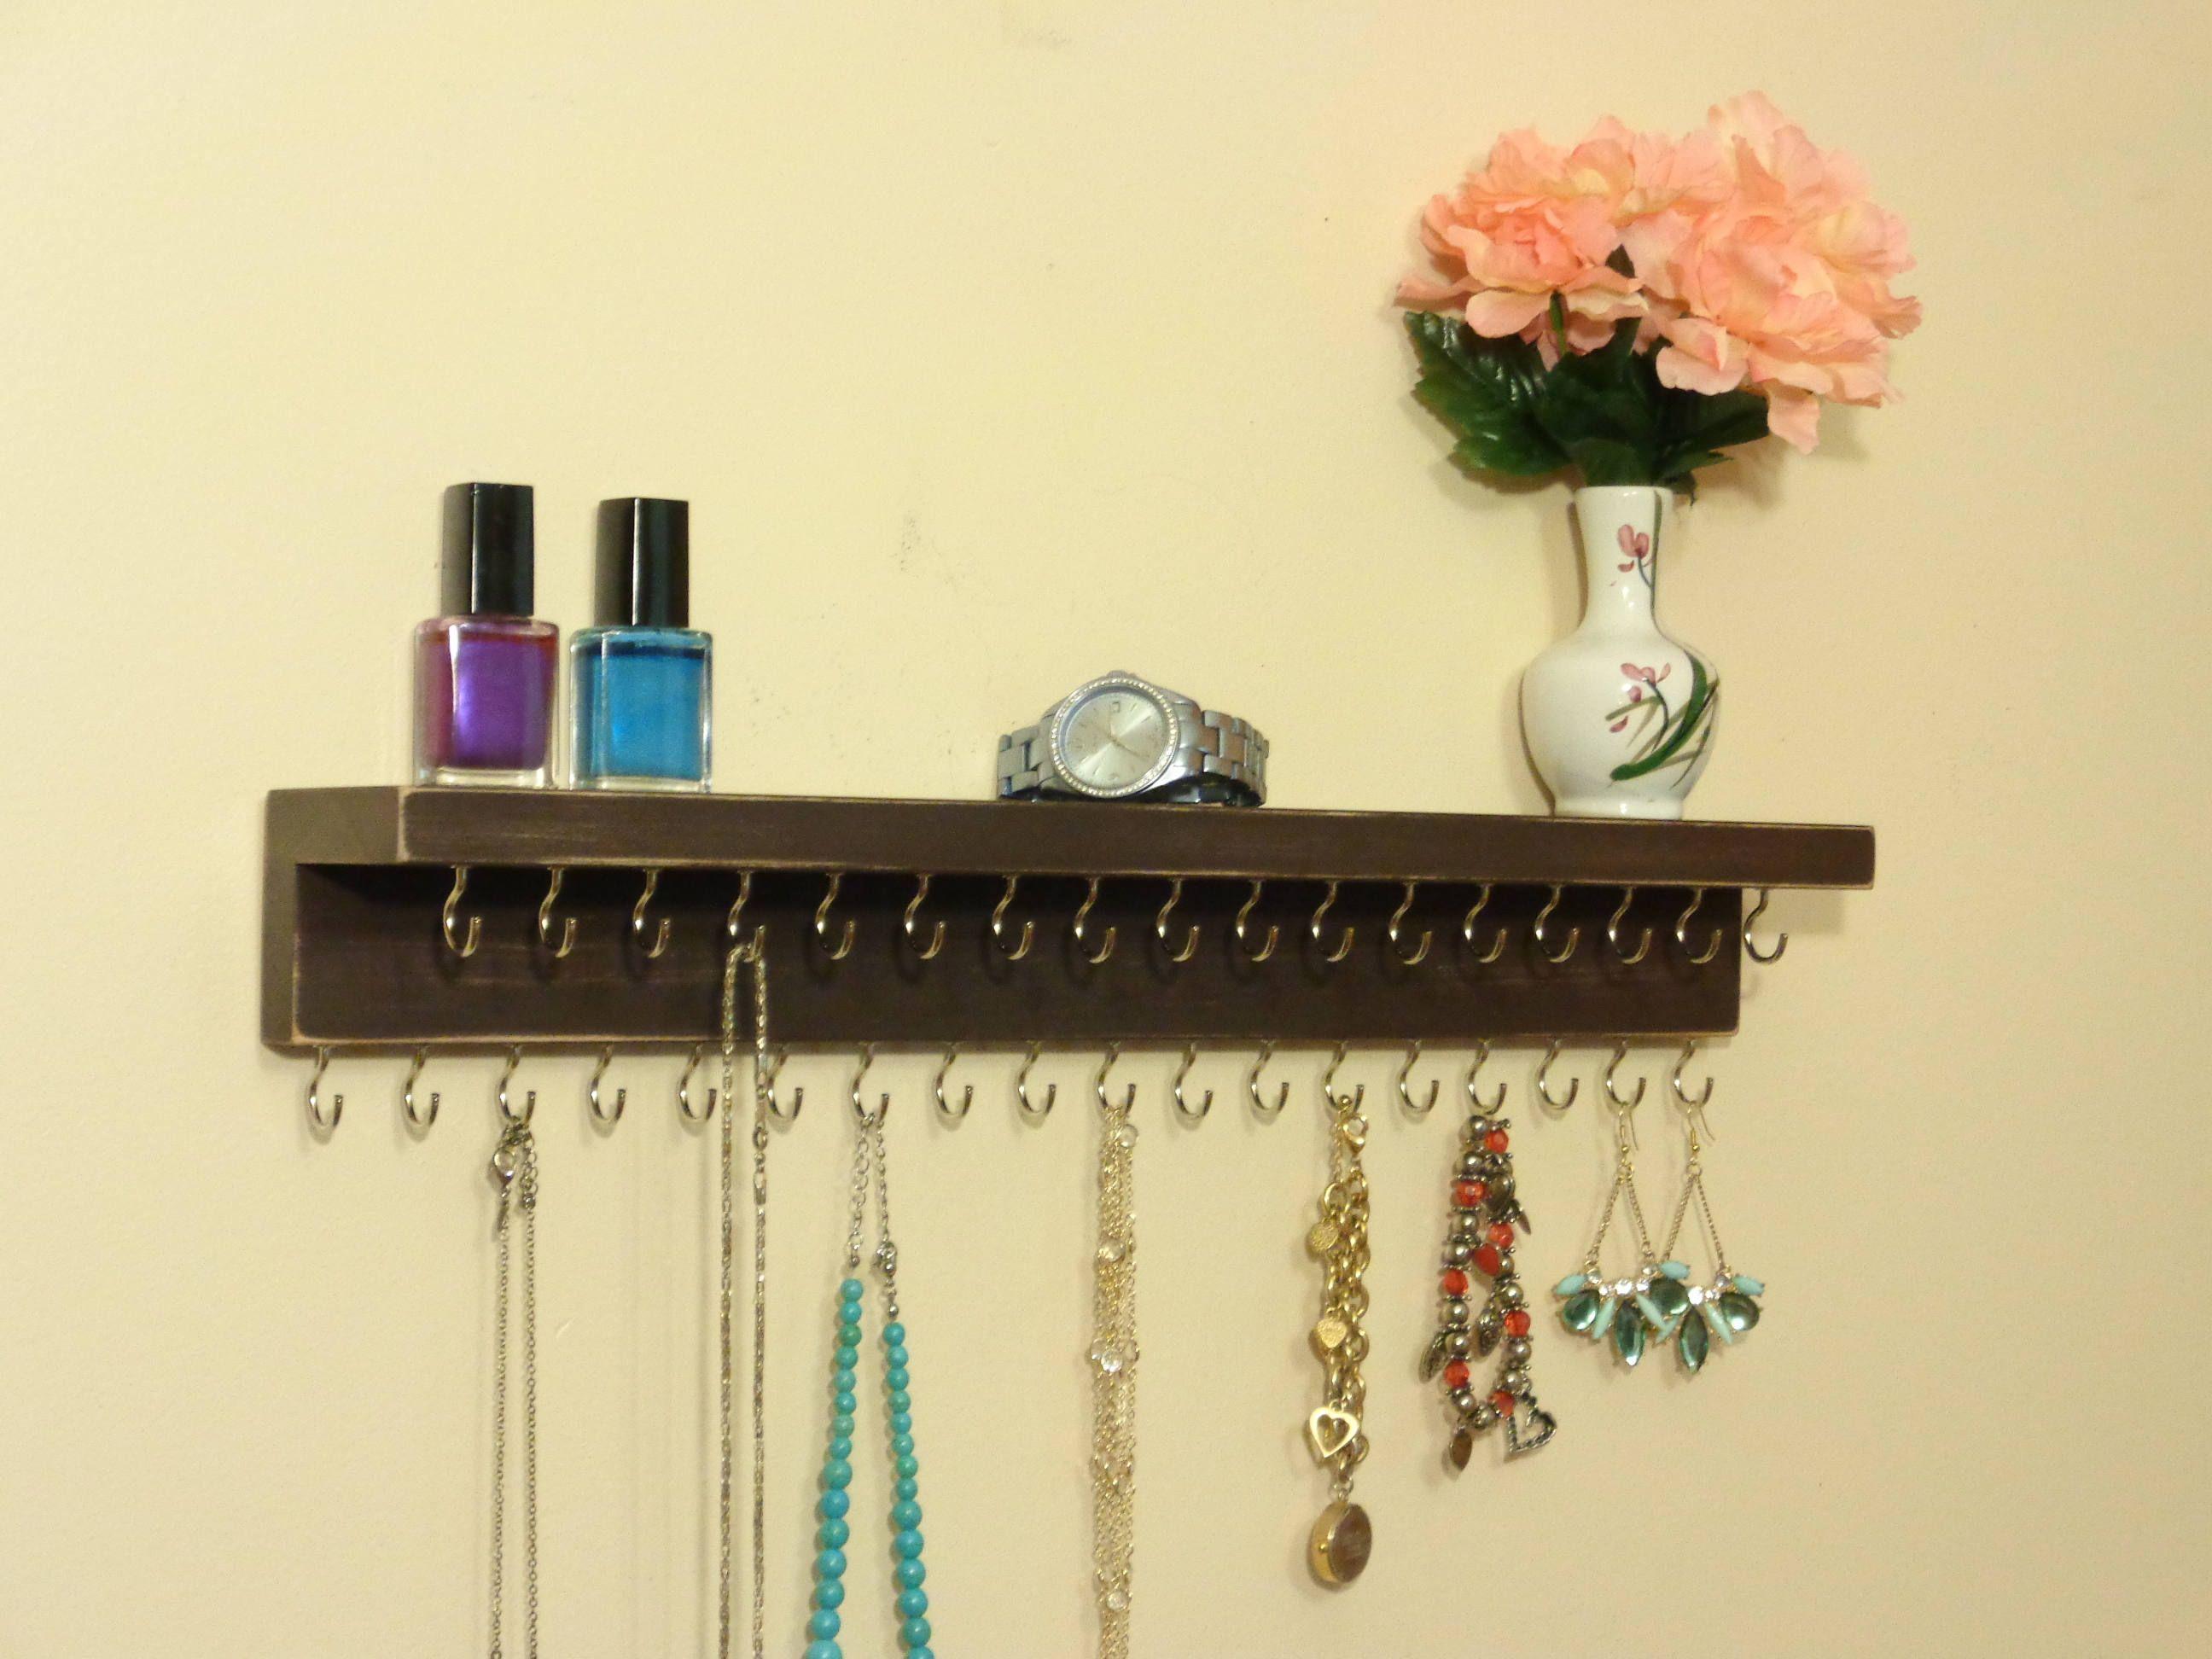 Jewelry Rack - Necklace Holder - Jewelry Organizer - Distressed Dark ...